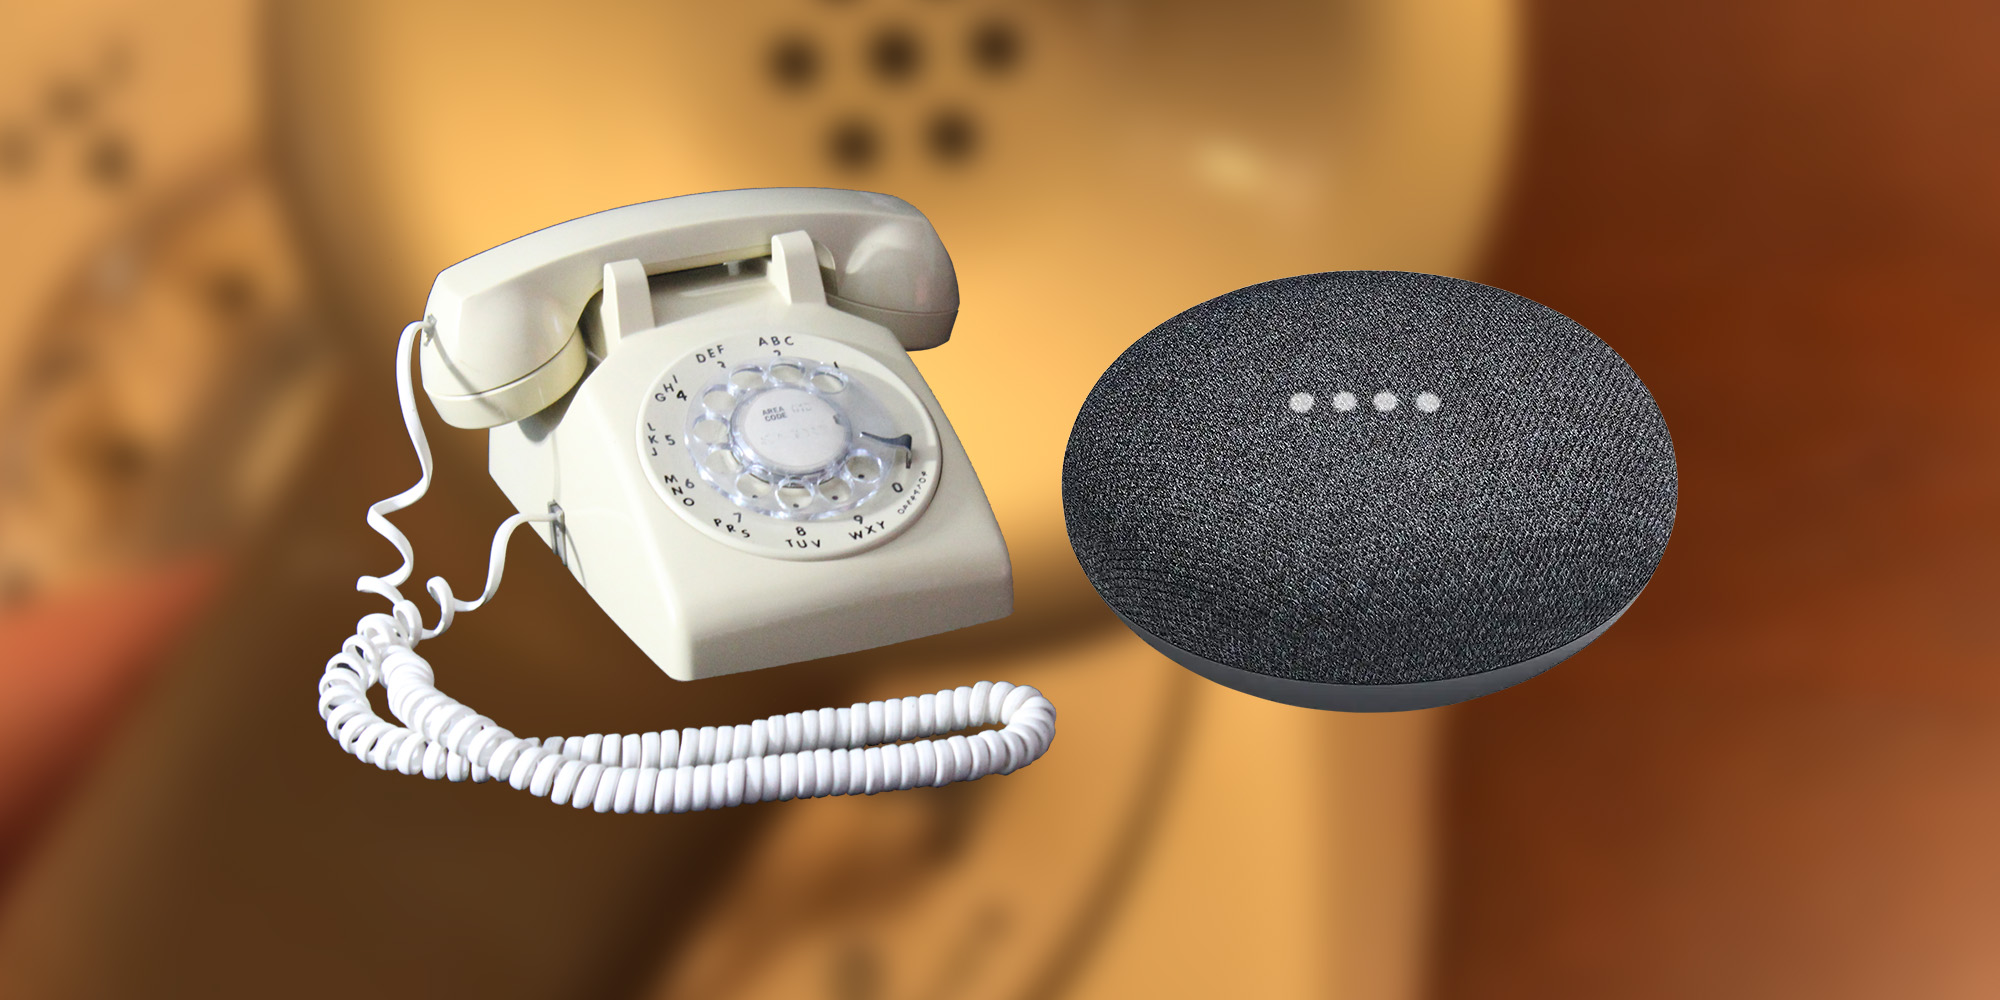 DIY mod puts Google Home Mini in a rotary phone - 9to5Google